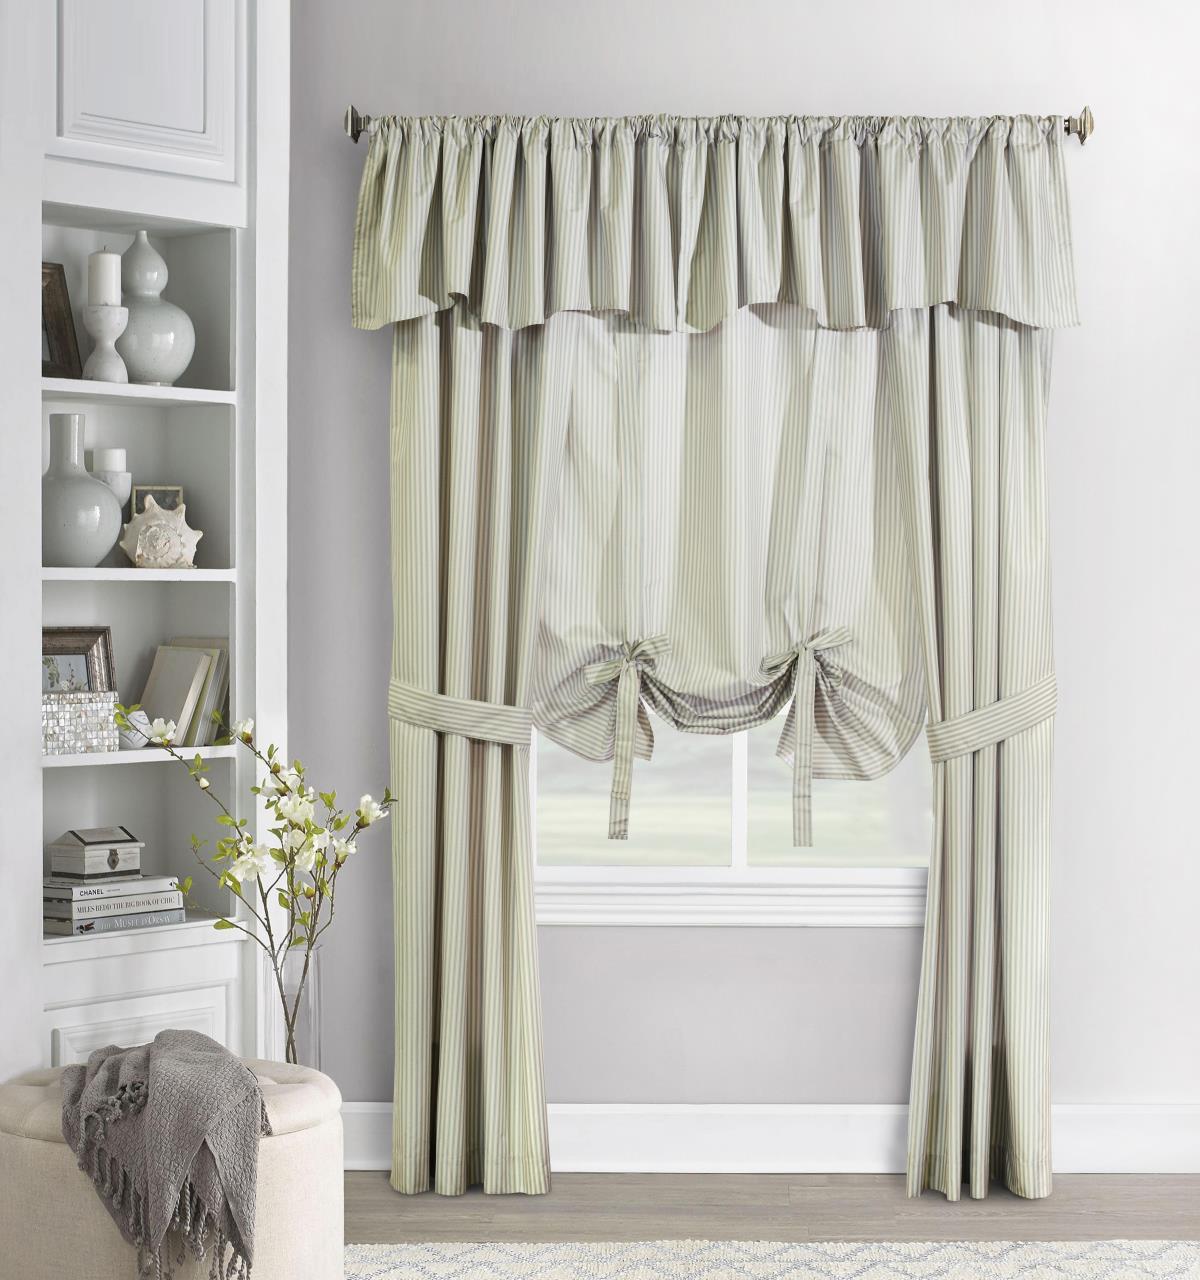 Ticking Stripe Curtain - 069556519817